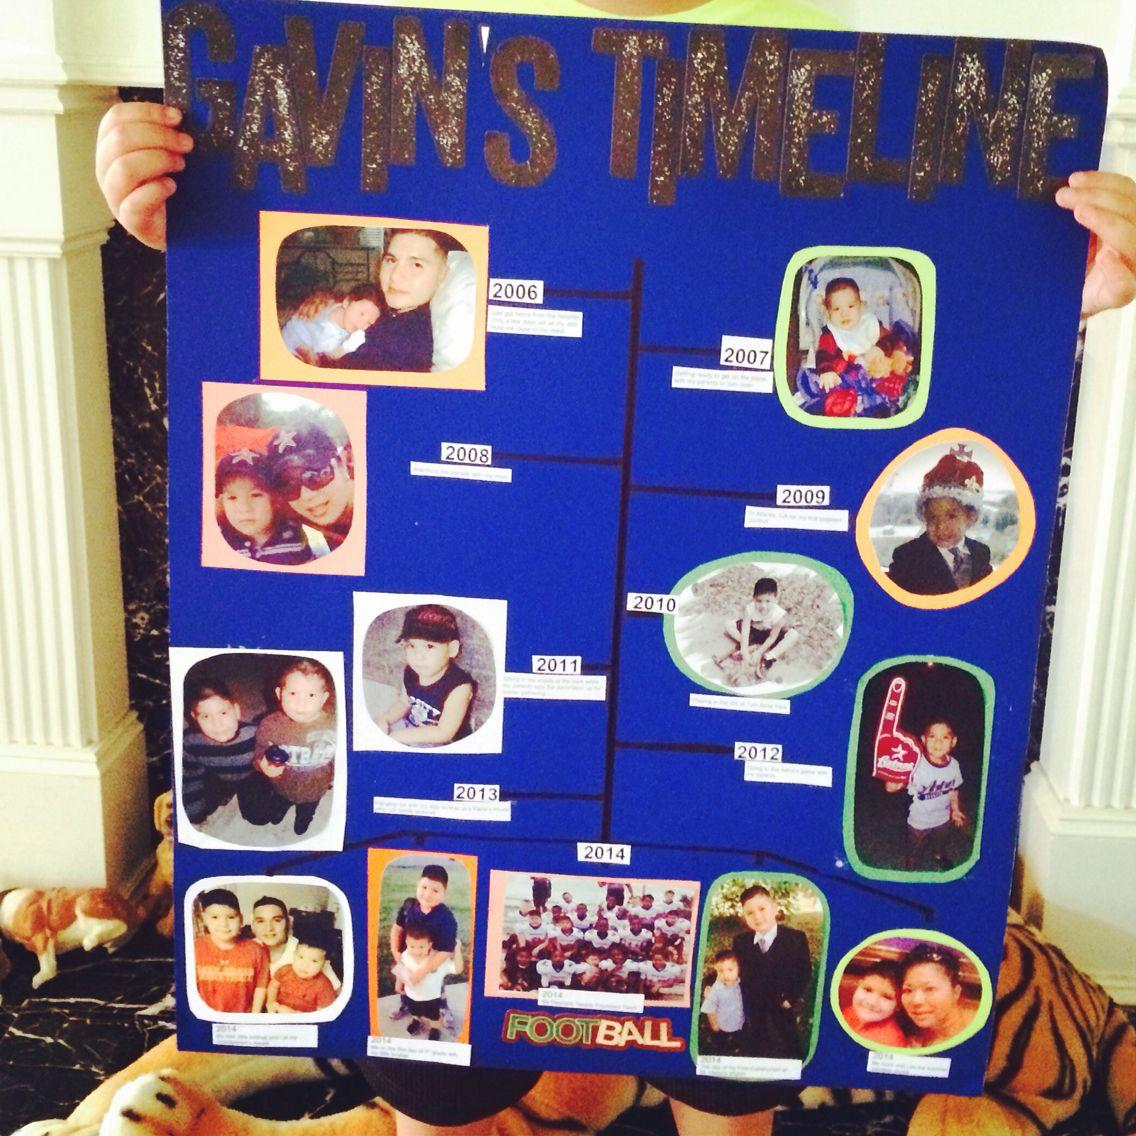 Gavin's timeline project 3rd grade   Kids timeline ...  Creative Timeline Project Ideas